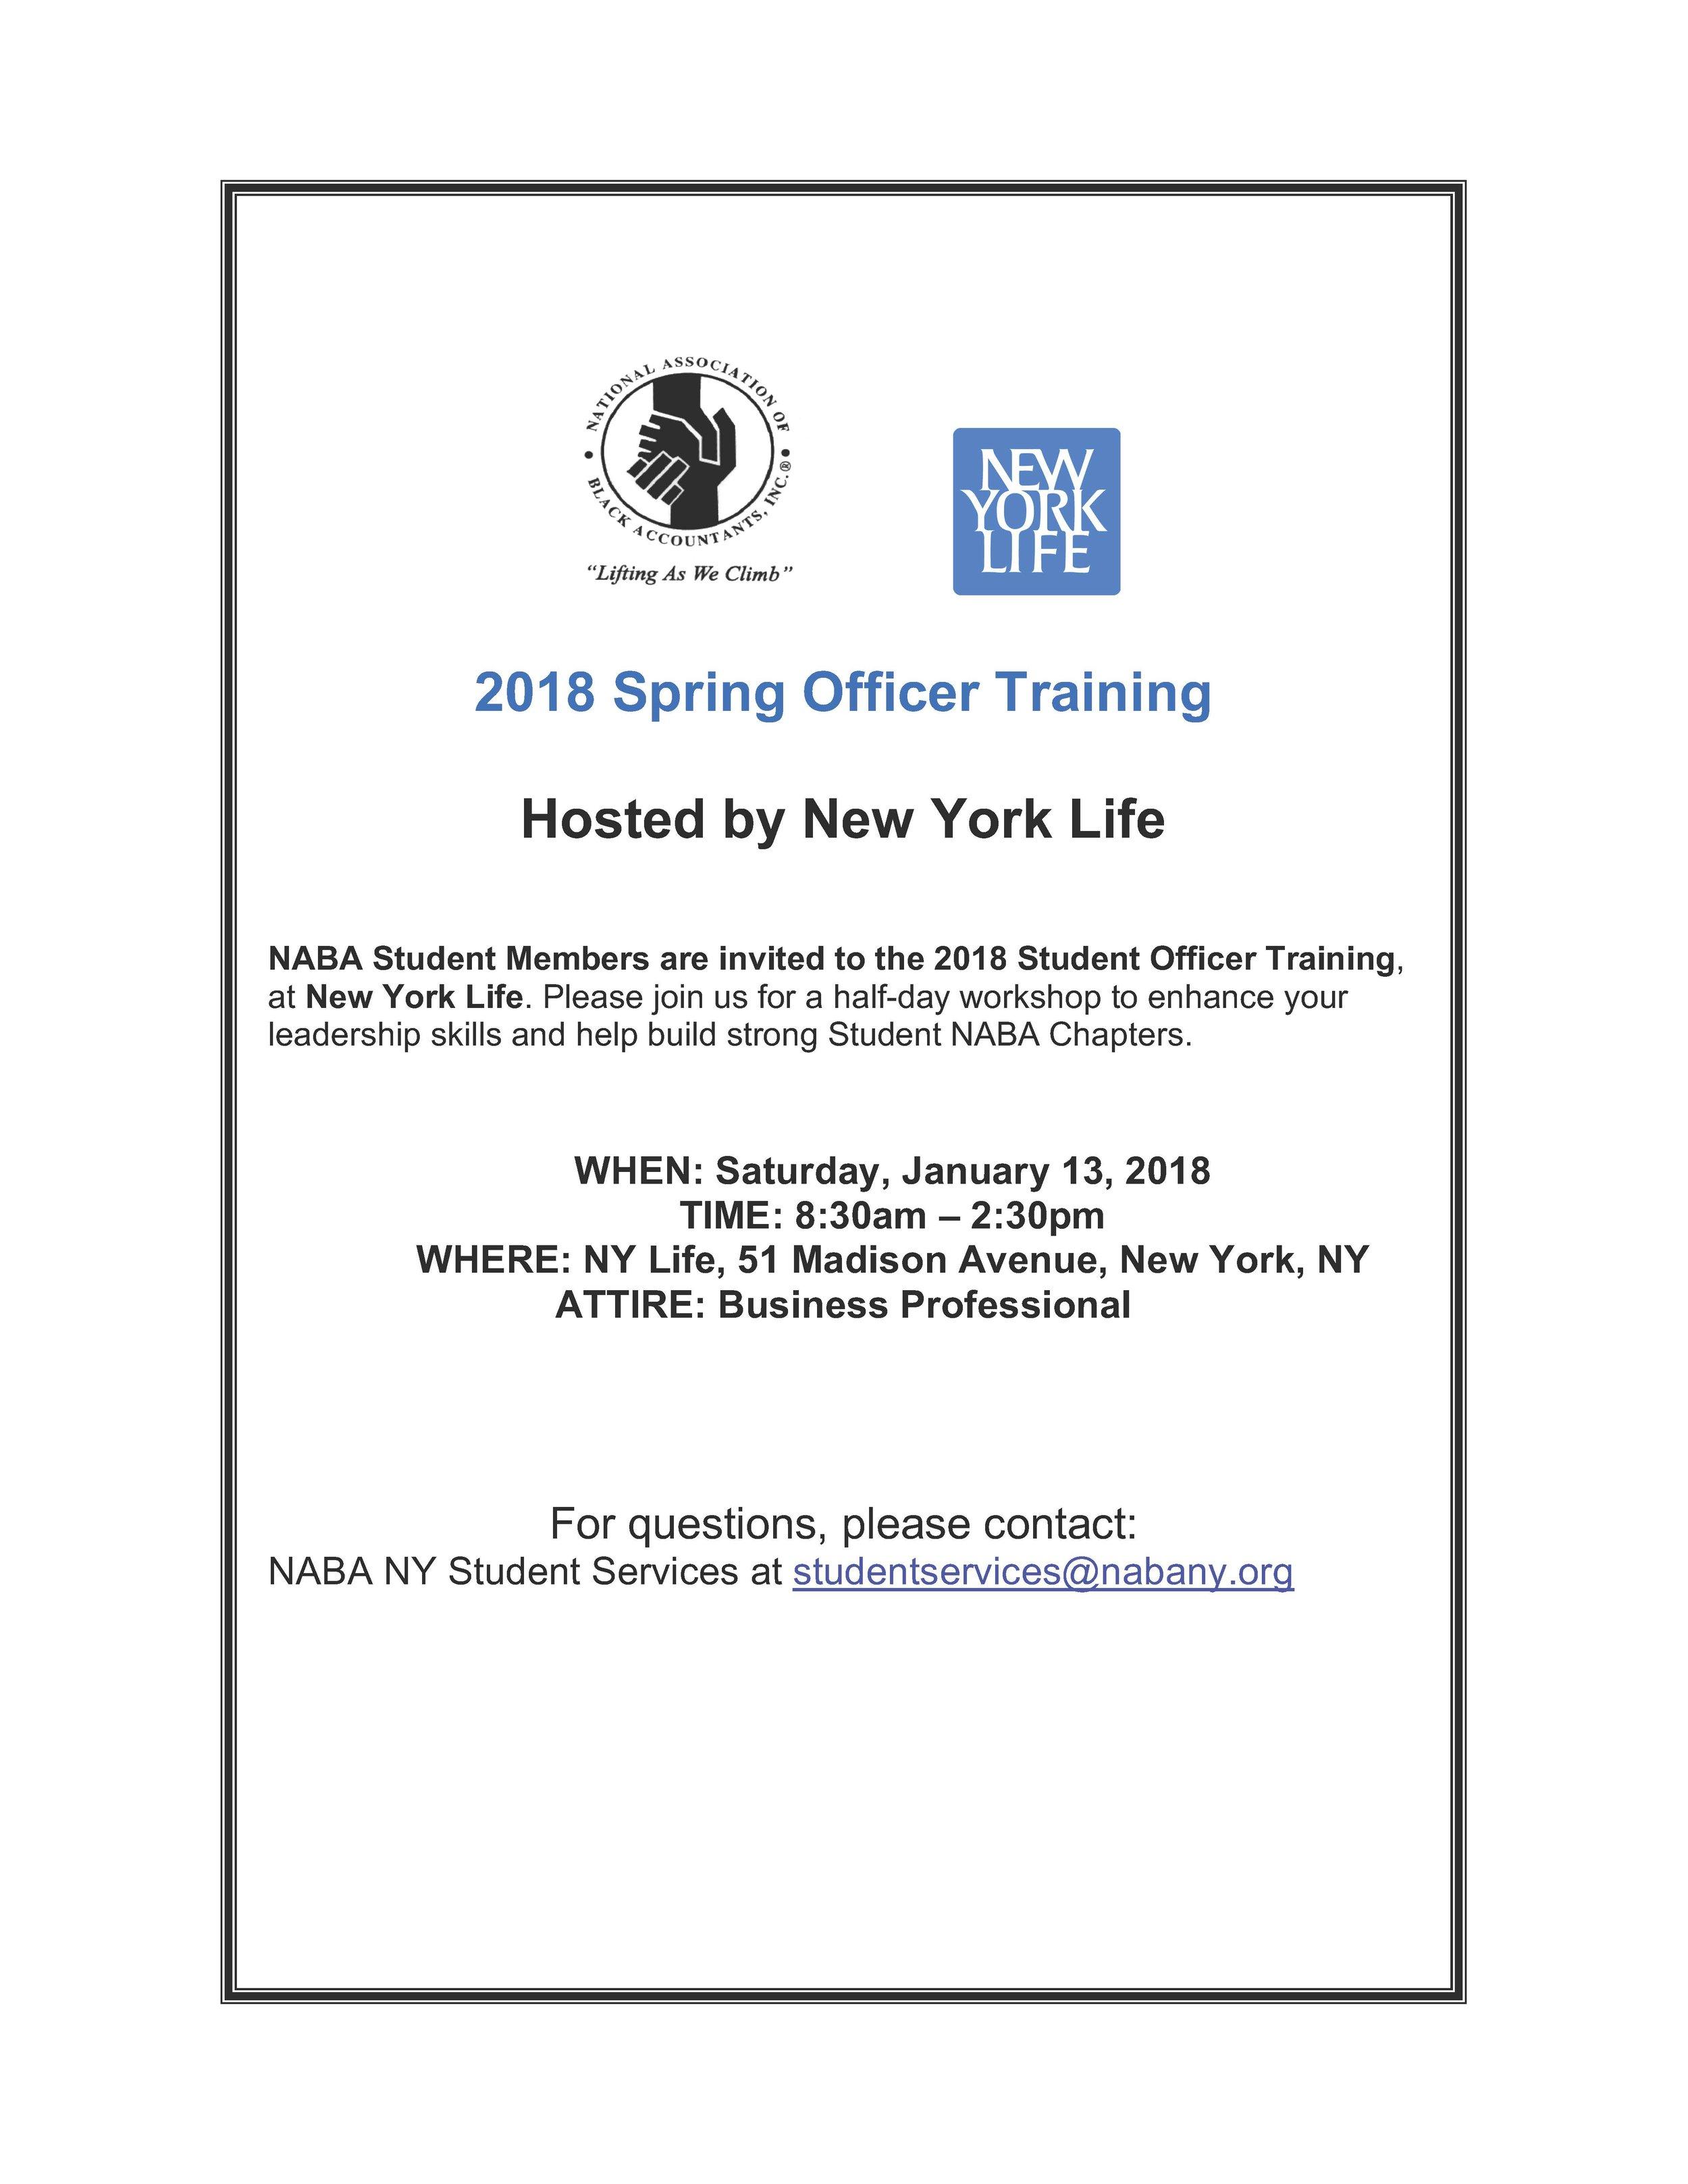 2018 Spring Officer Training NYL.jpg